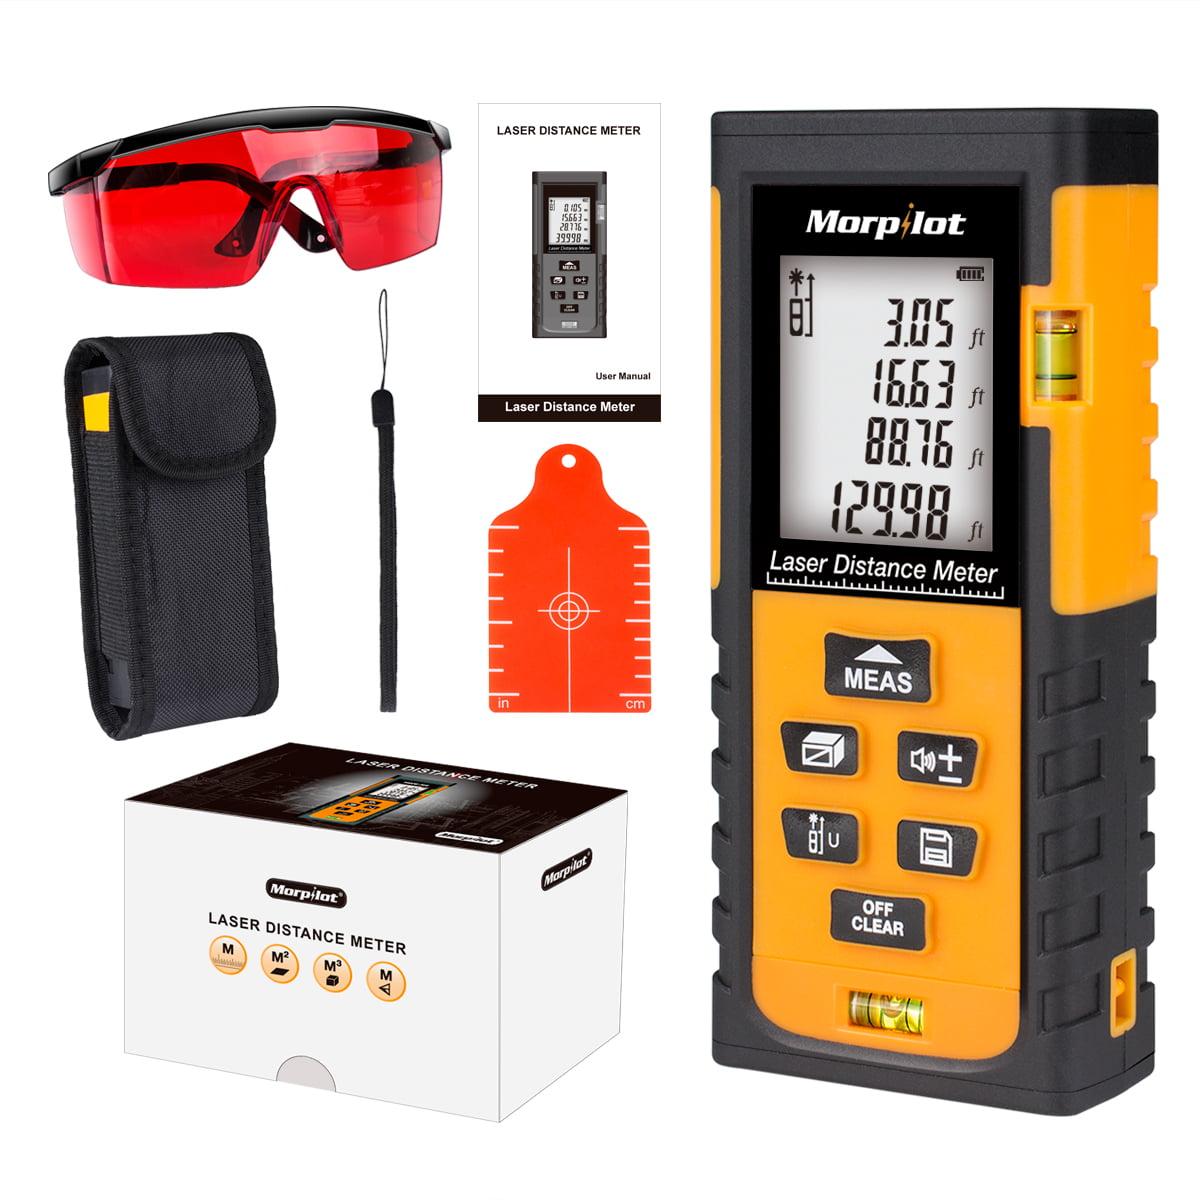 Laser Measure Morpilot 131ft Laser Tape Measure with Target Plate & Enhancing Glasses,... by